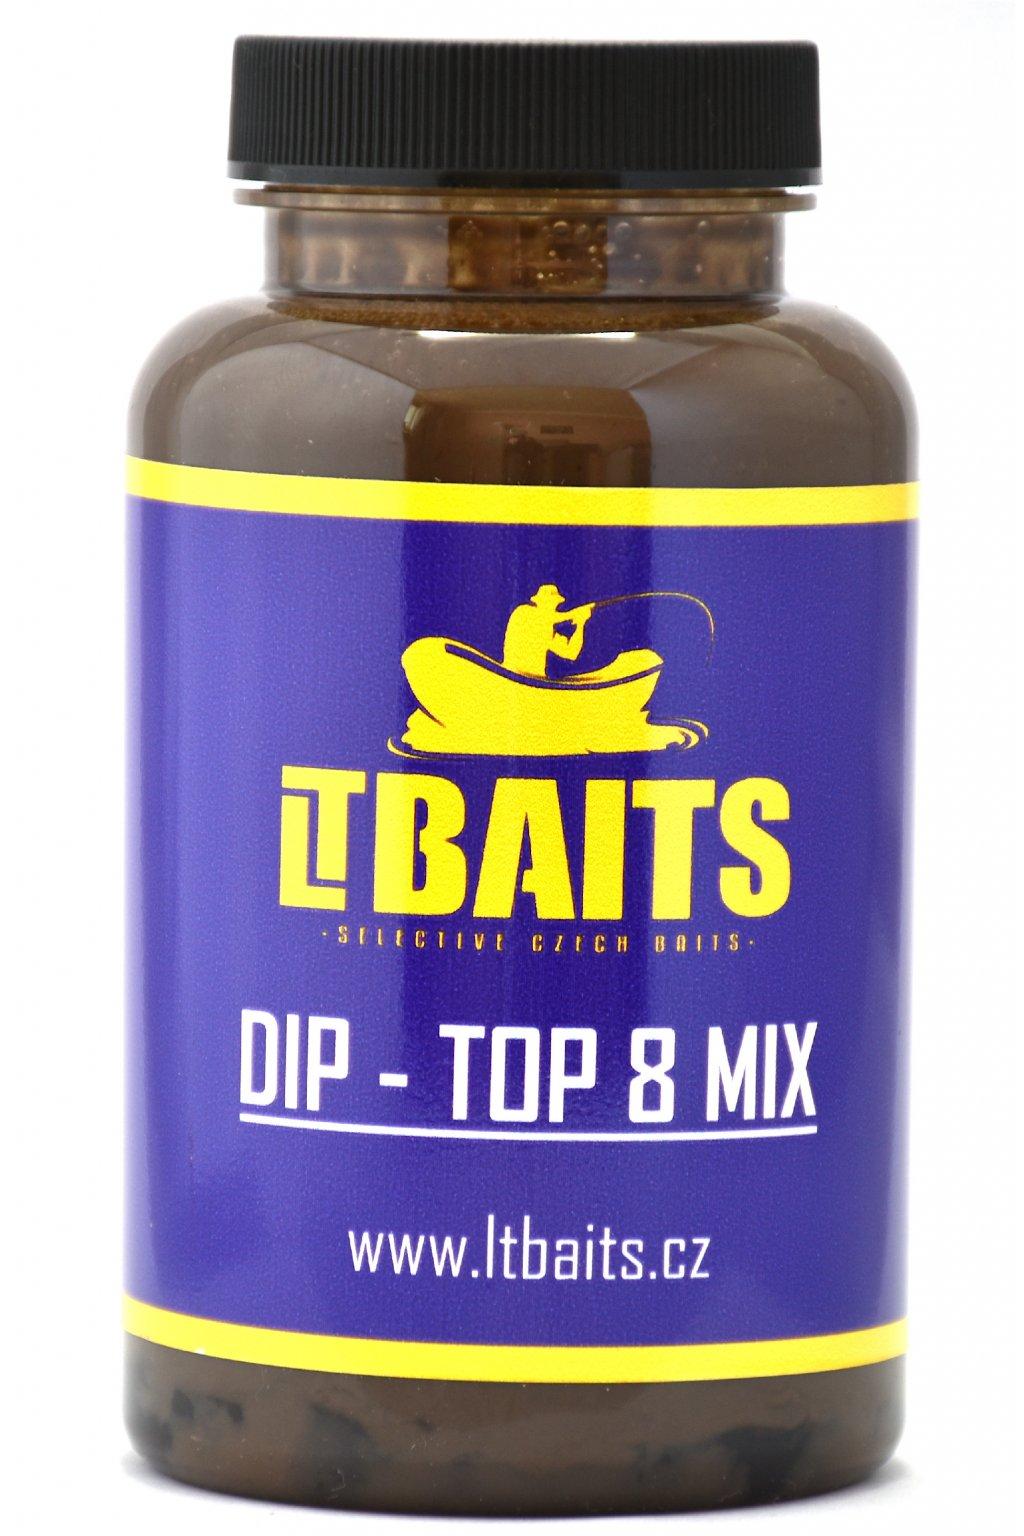 LT Baits DIP TOP 8 Mix - 300g